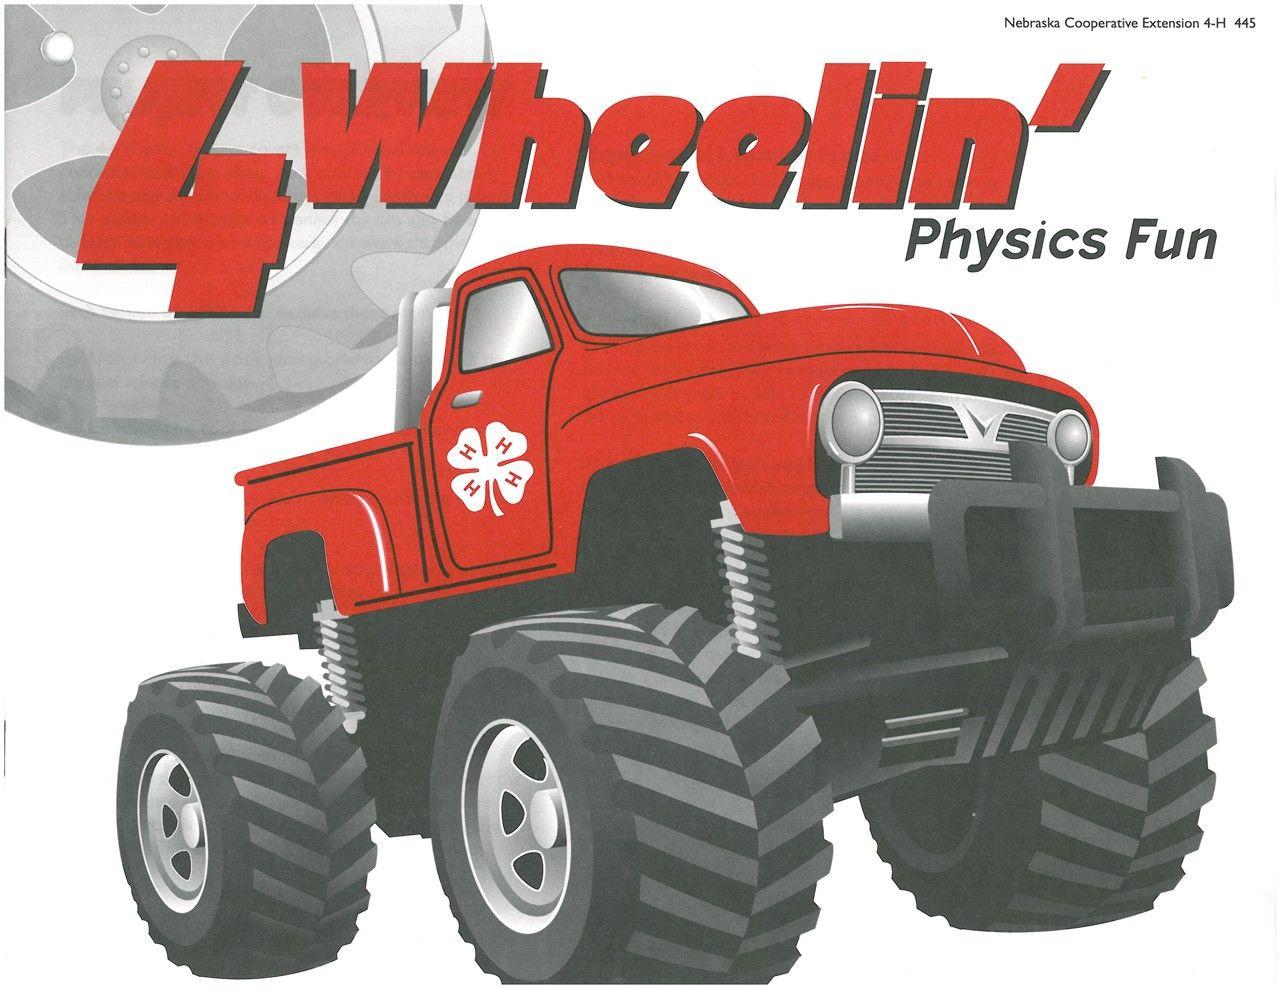 4 Wheelin Physics Fun